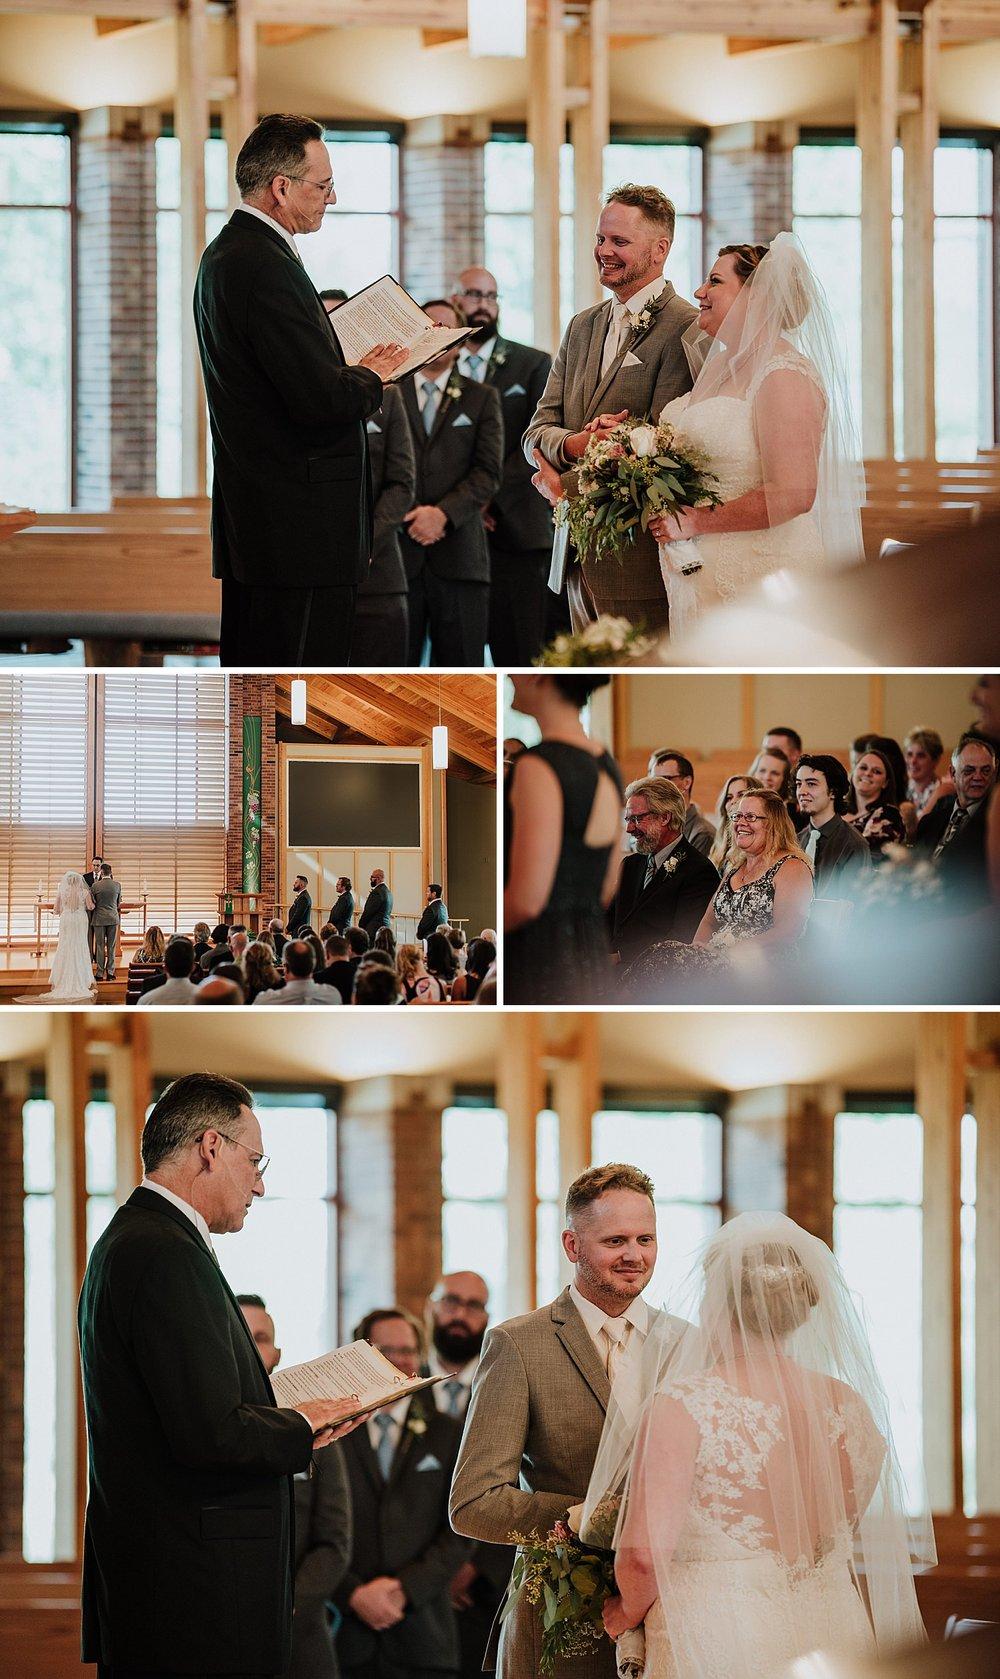 Terrace-167-Documentary-Wedding-Photographer_0012.jpg